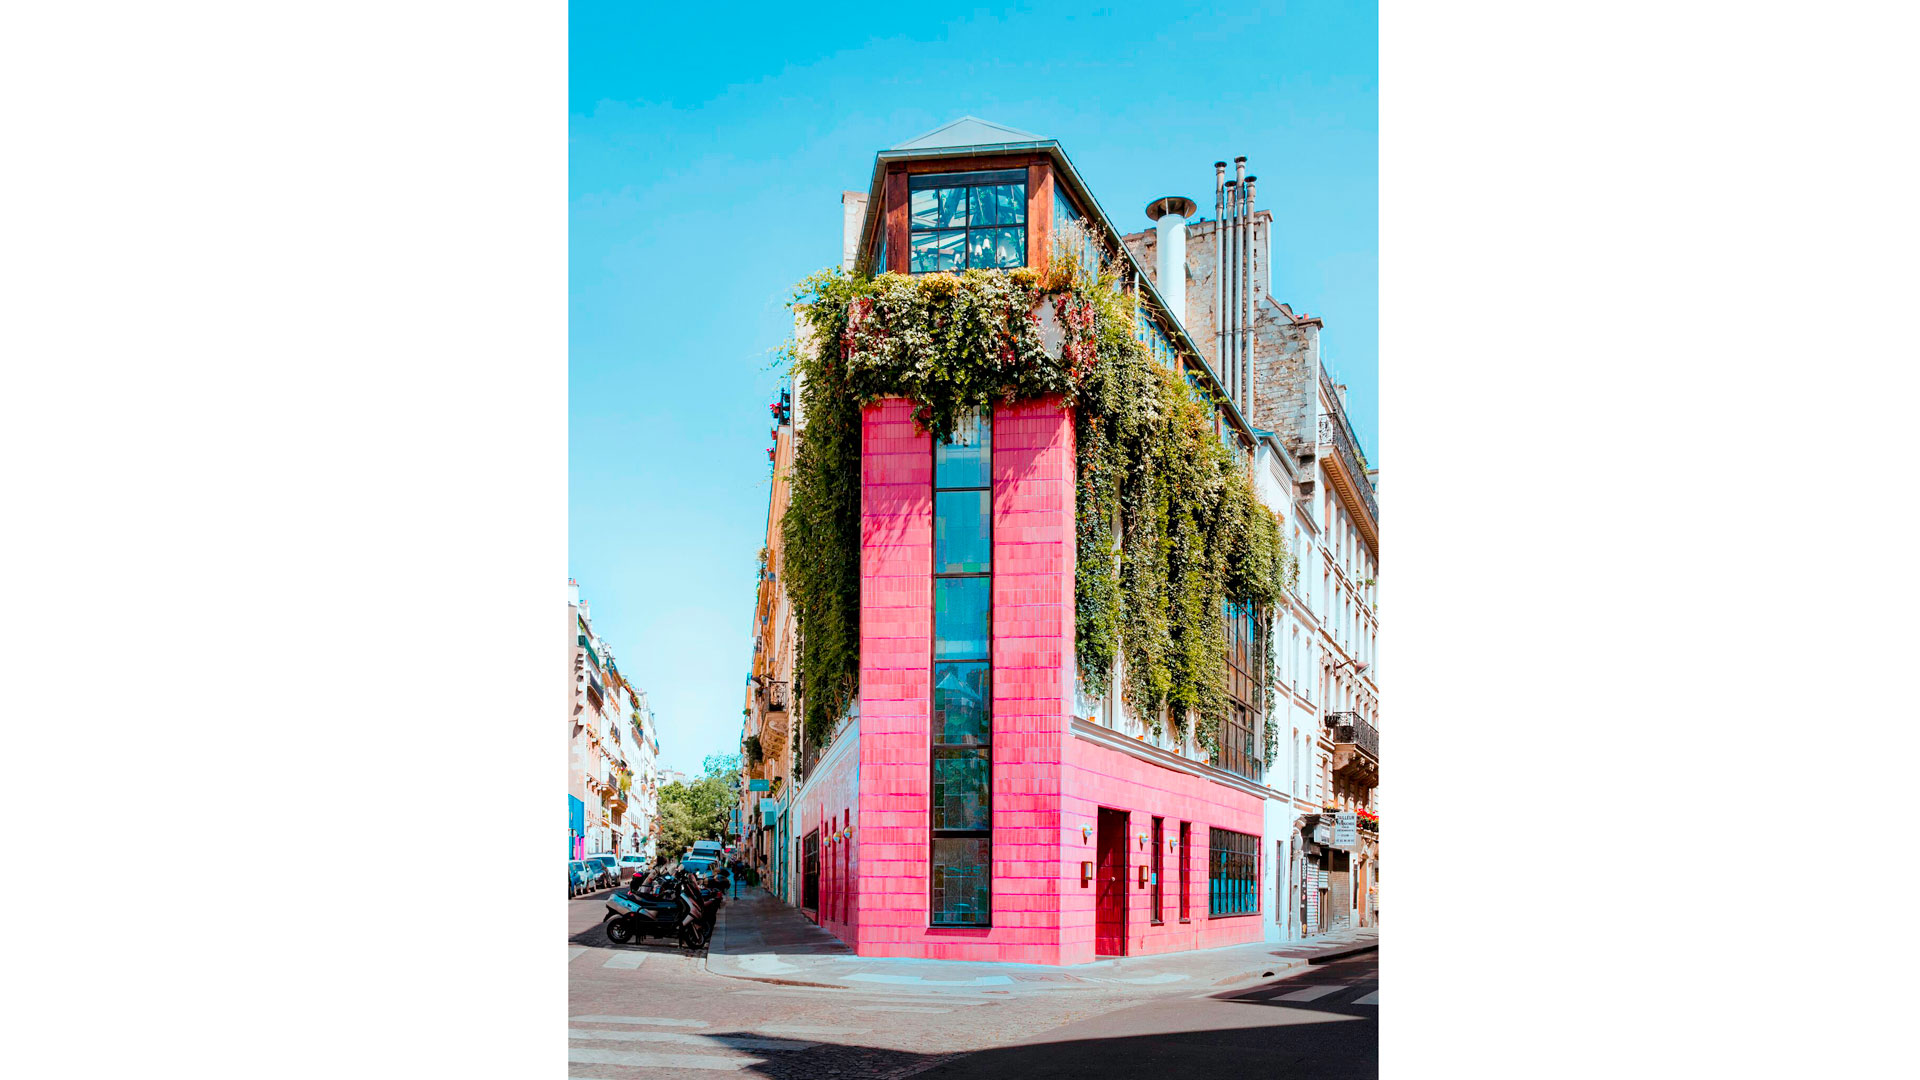 Imagen del bistrot Pink Mamma en París